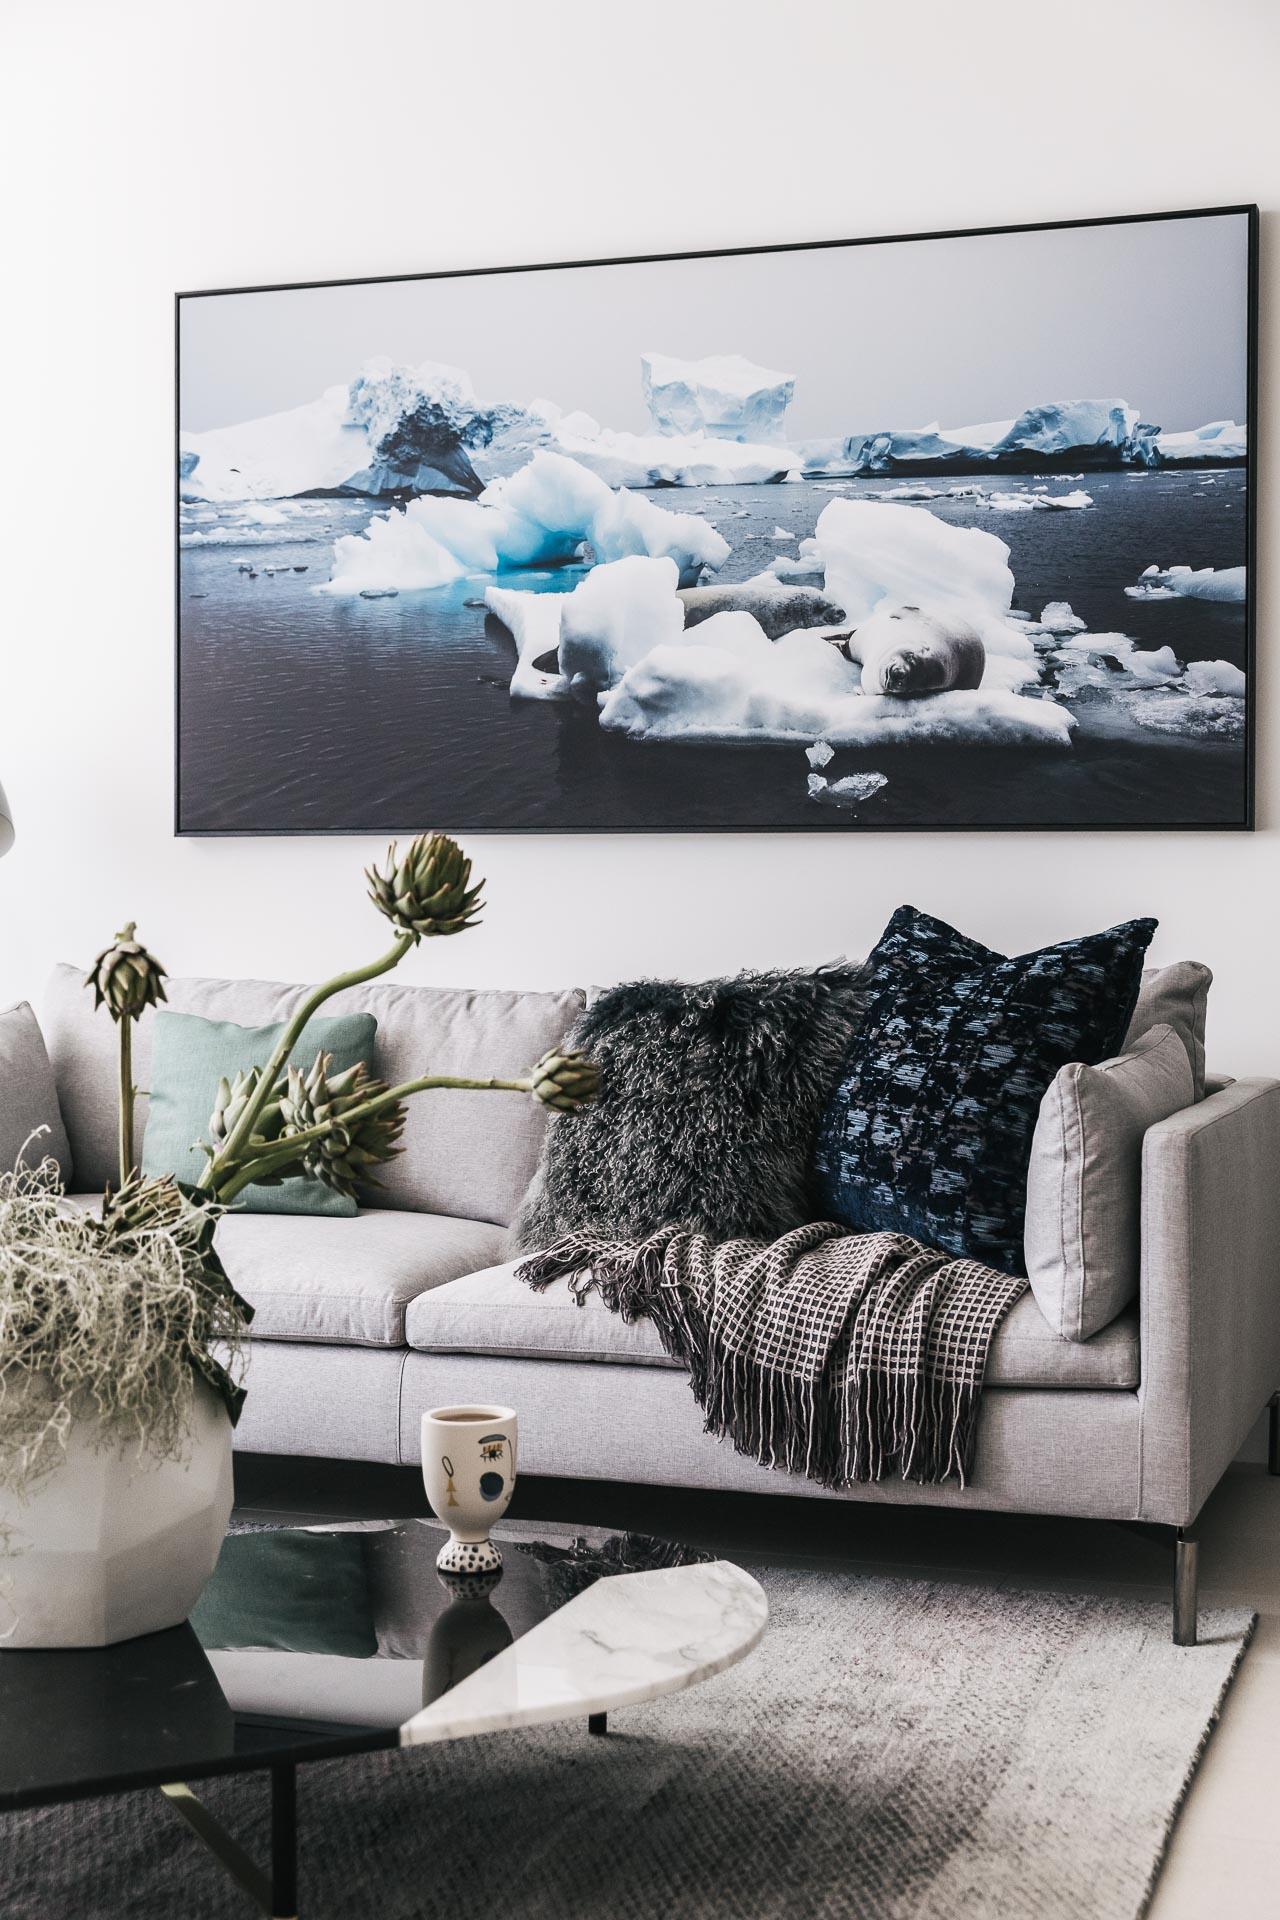 WEB - Architectural Photography Sydney - Open House Perth 2018  - Sebastian Photography 88.jpg